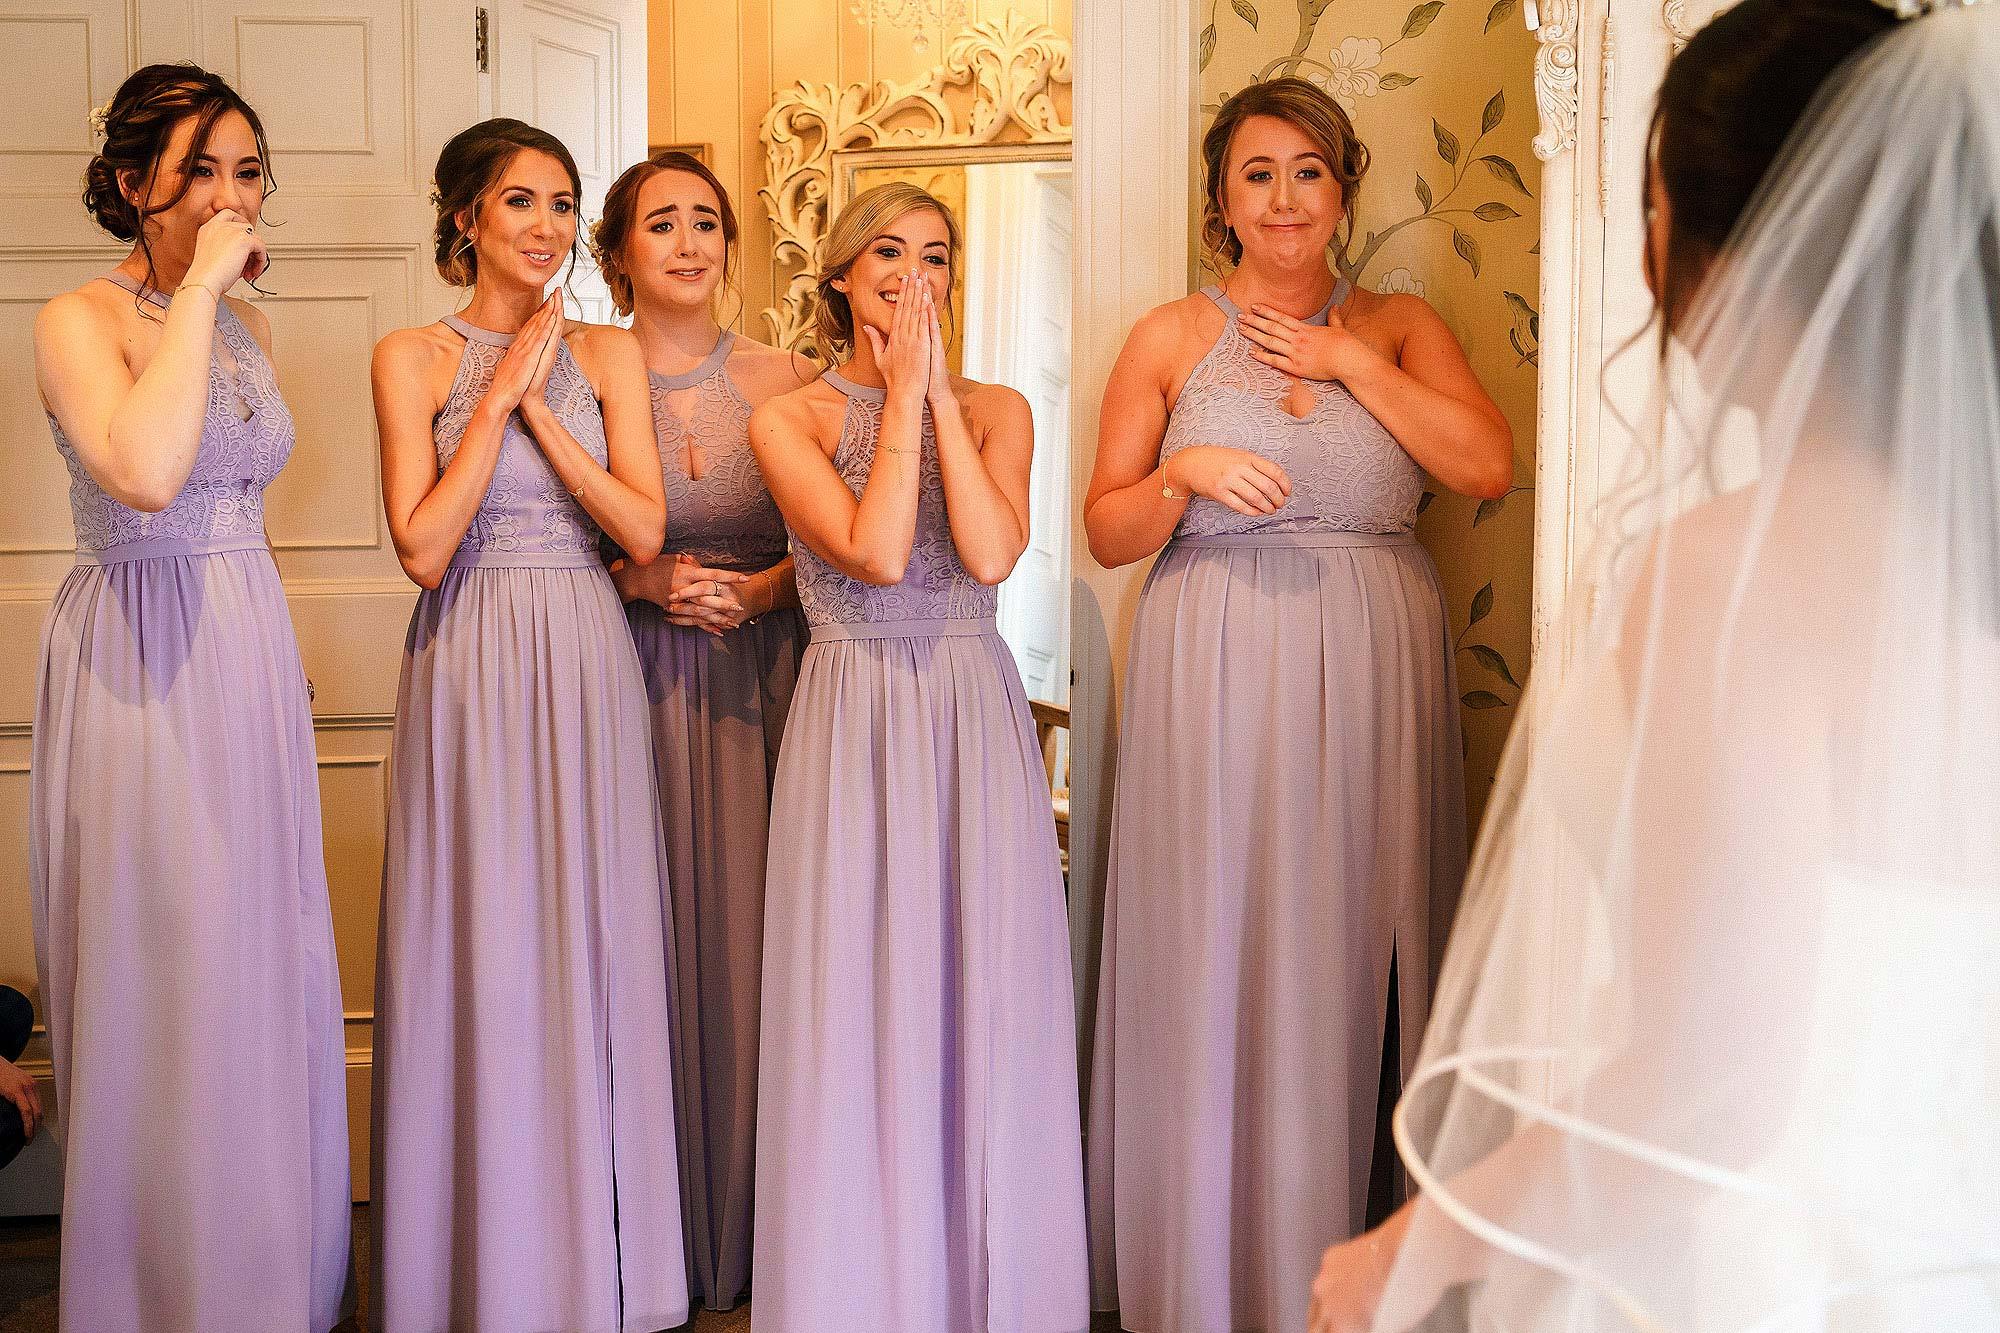 happy bridesmaids reacting to bride in wedding dress